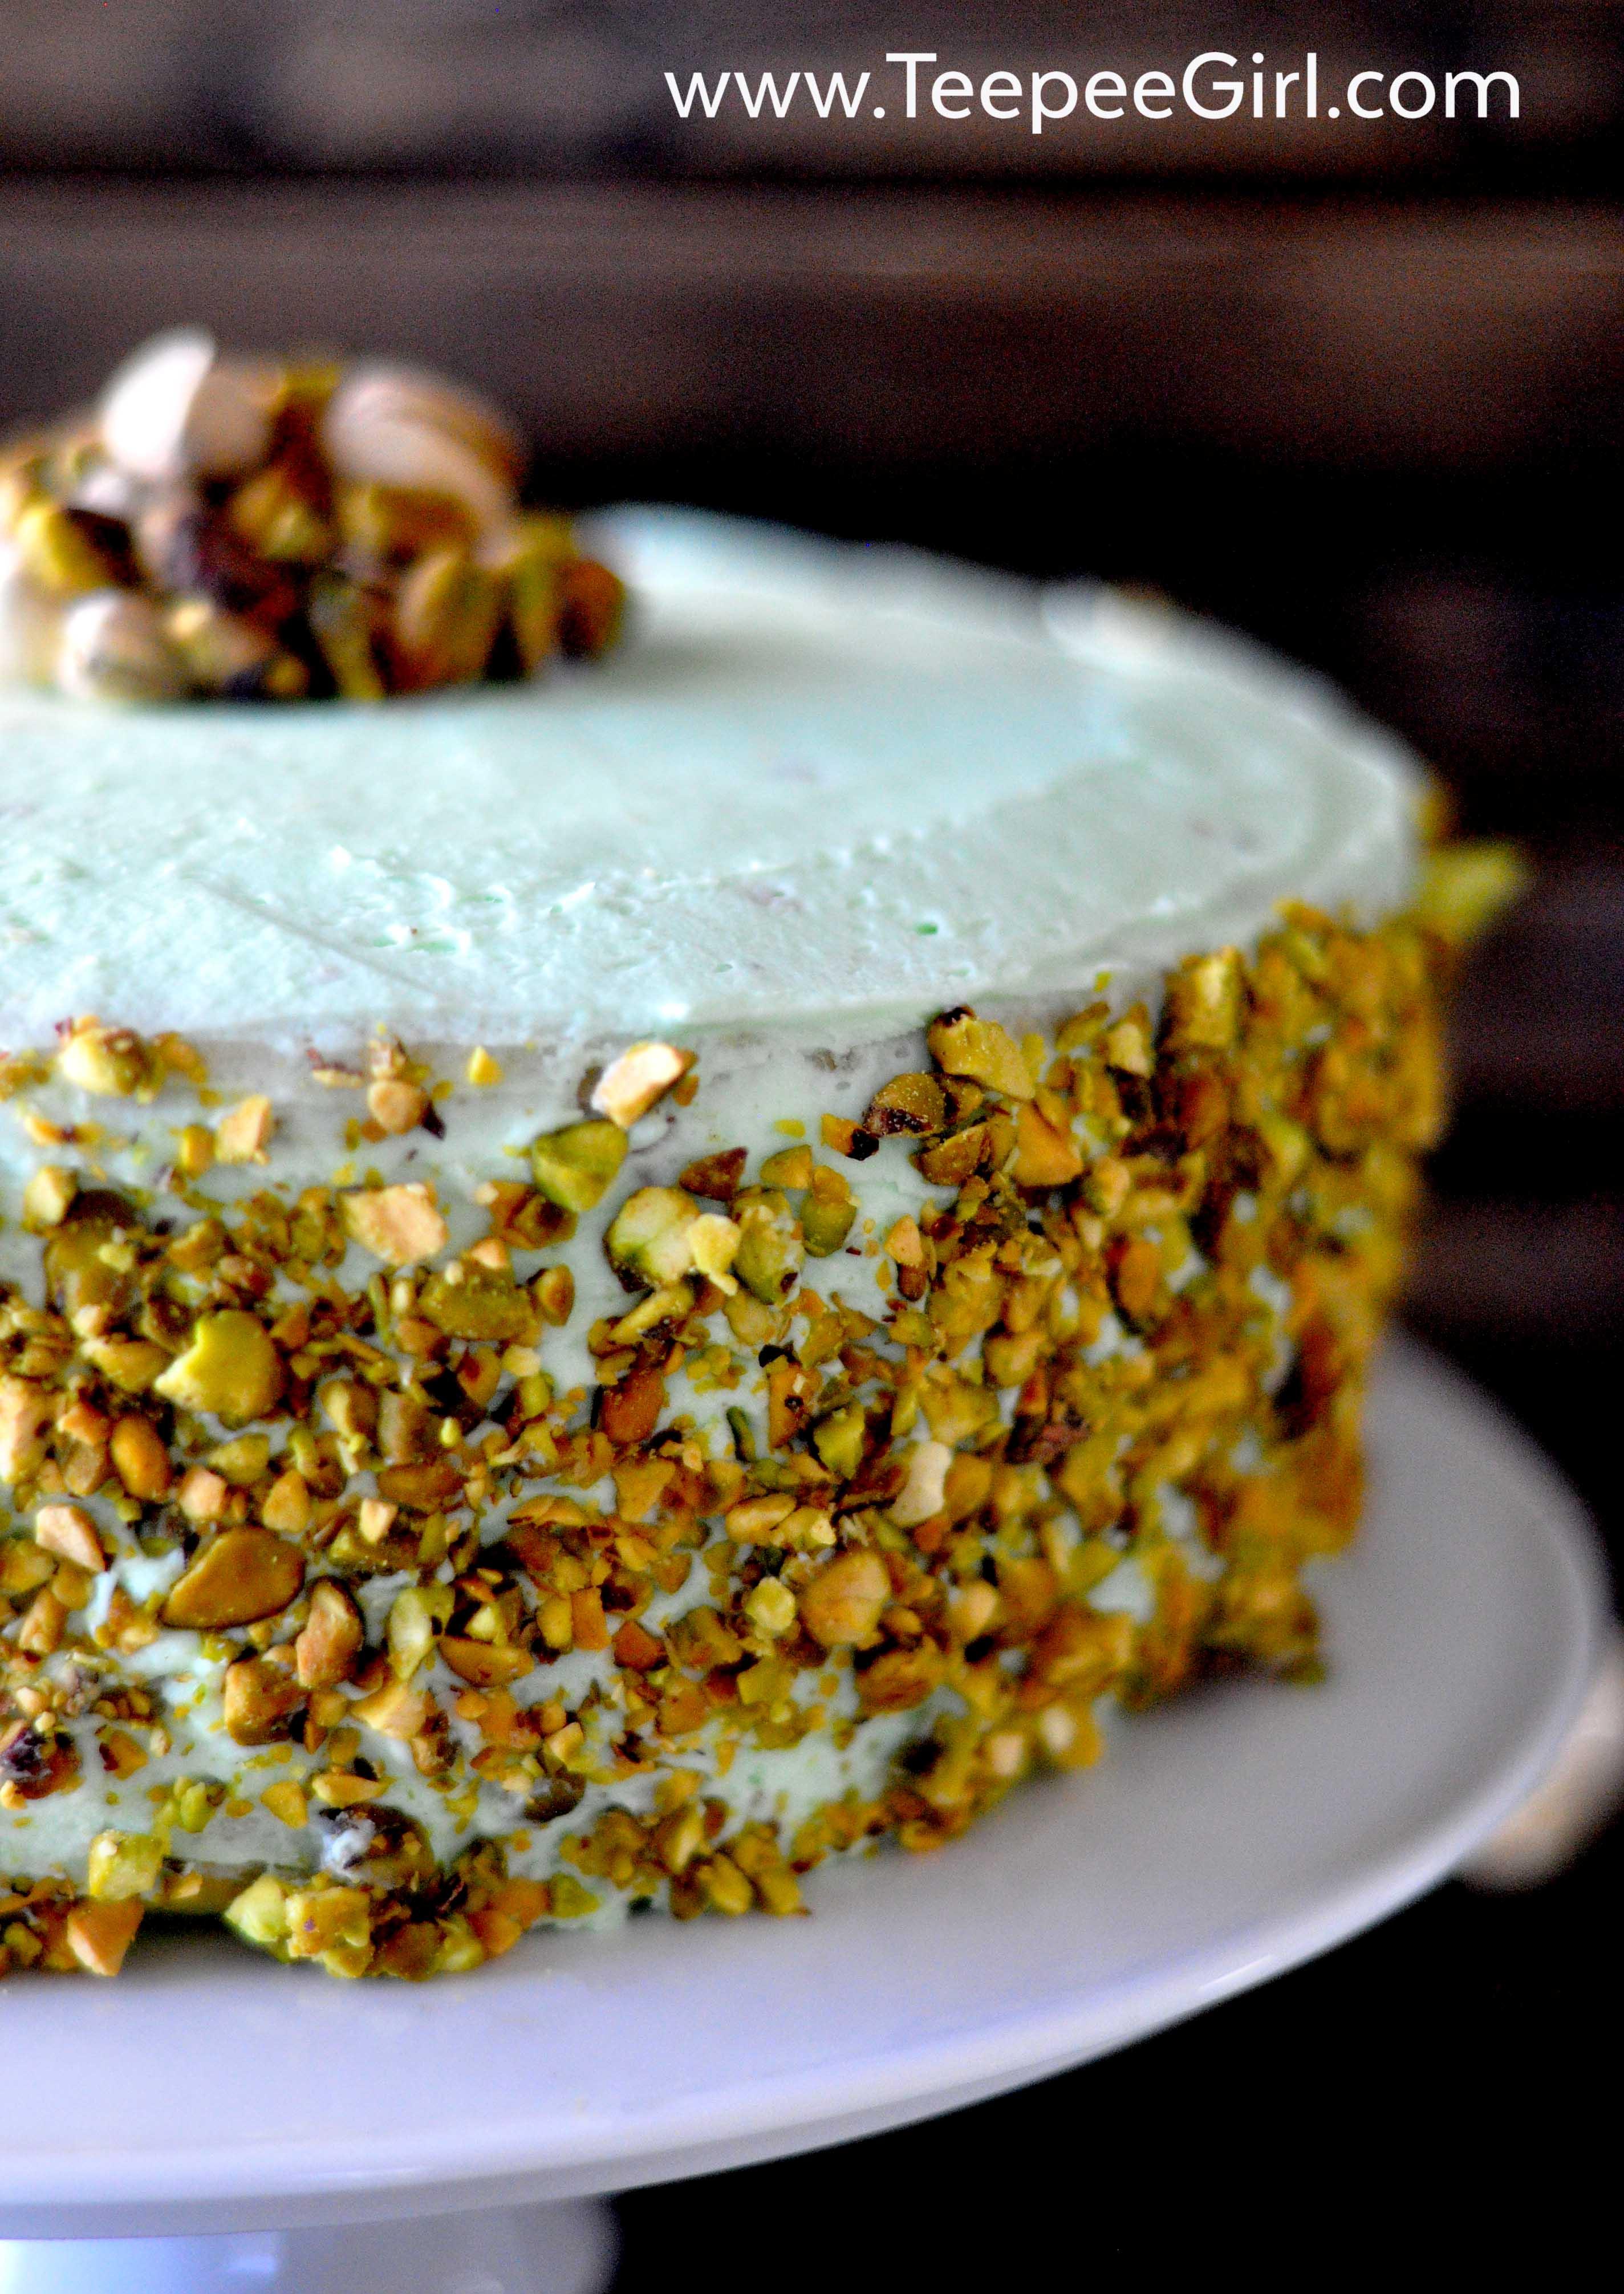 Pistachio Cake Recipe Without Pudding